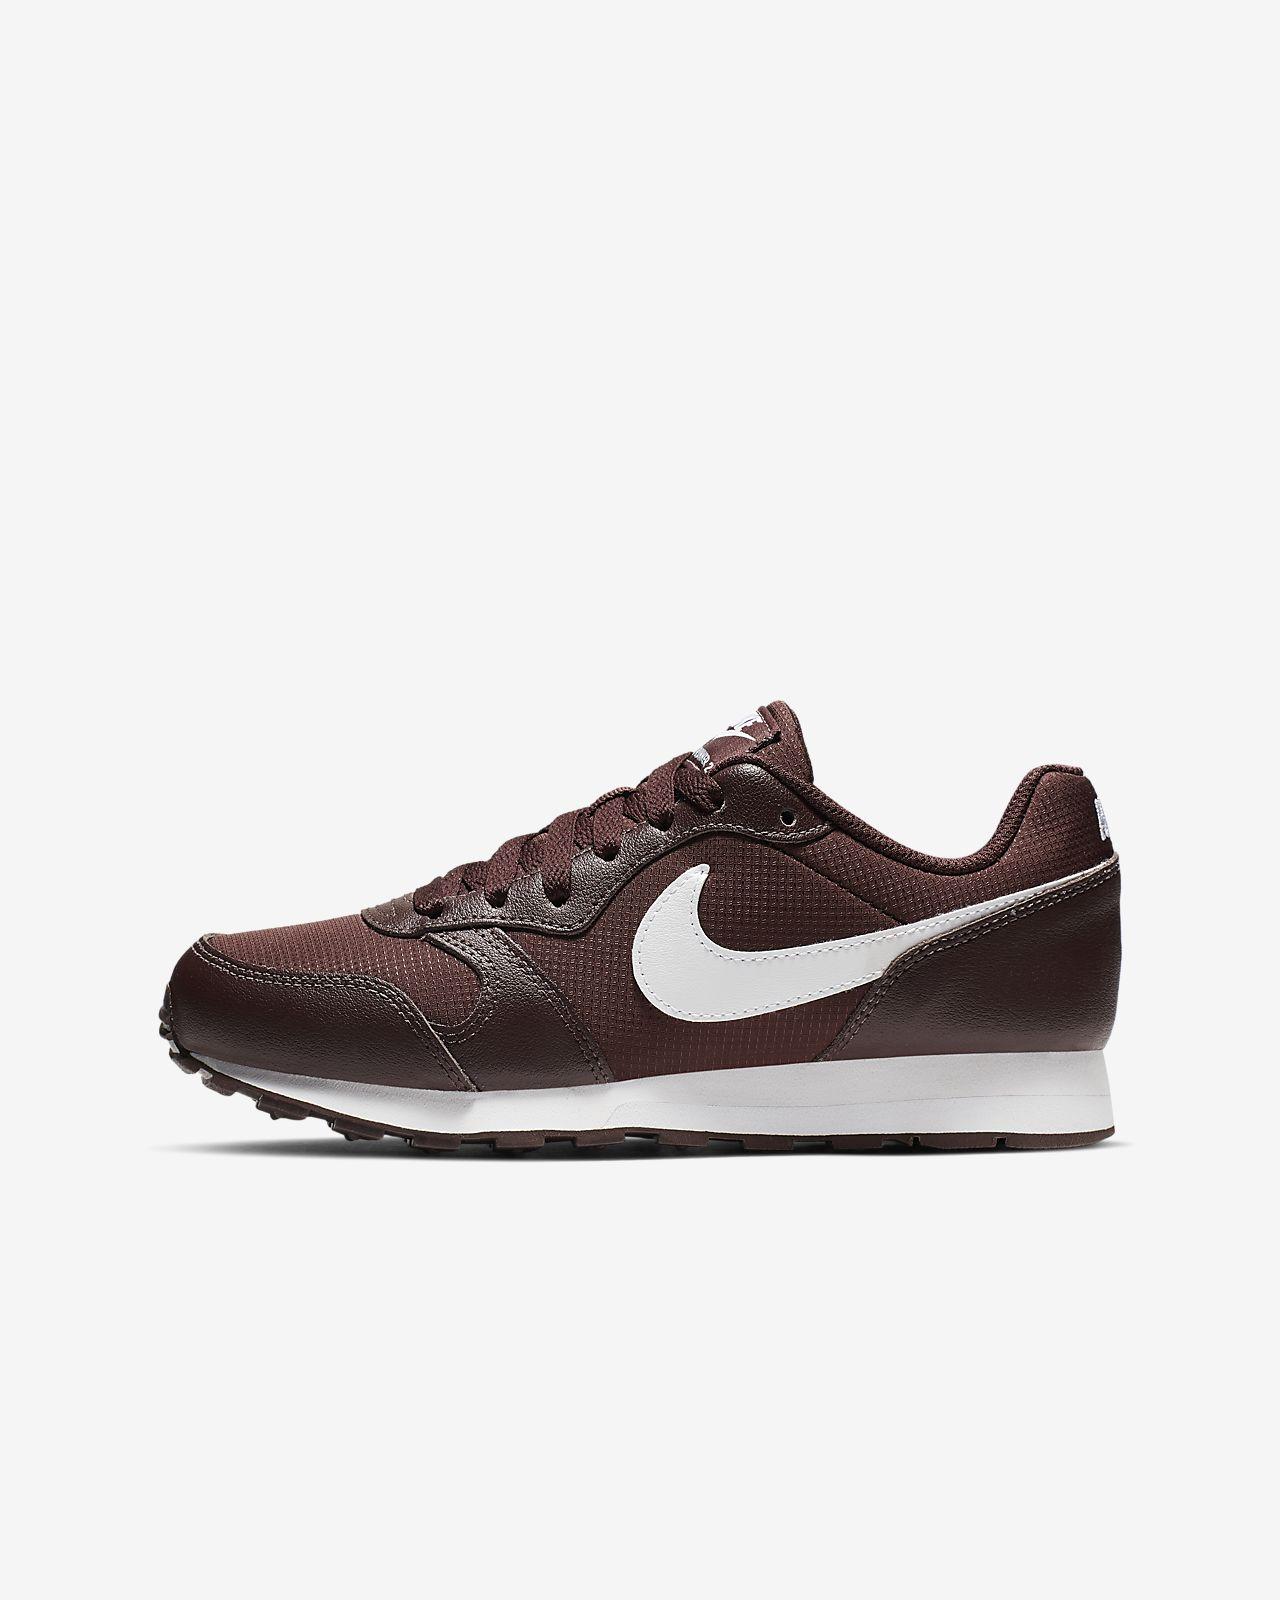 Nike MD Runner 2 PE Schuh für ältere Kinder